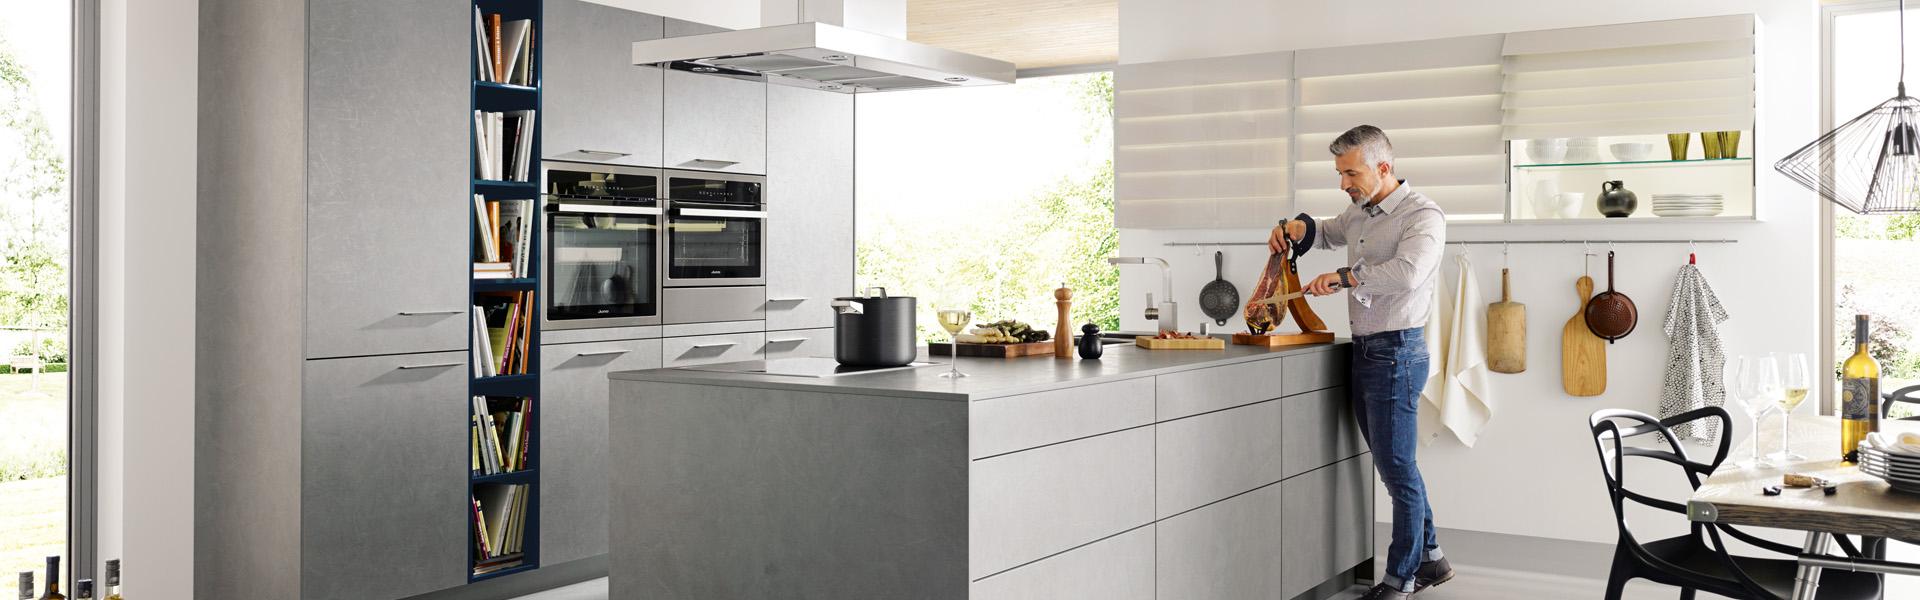 Wunderbar Küche Elba